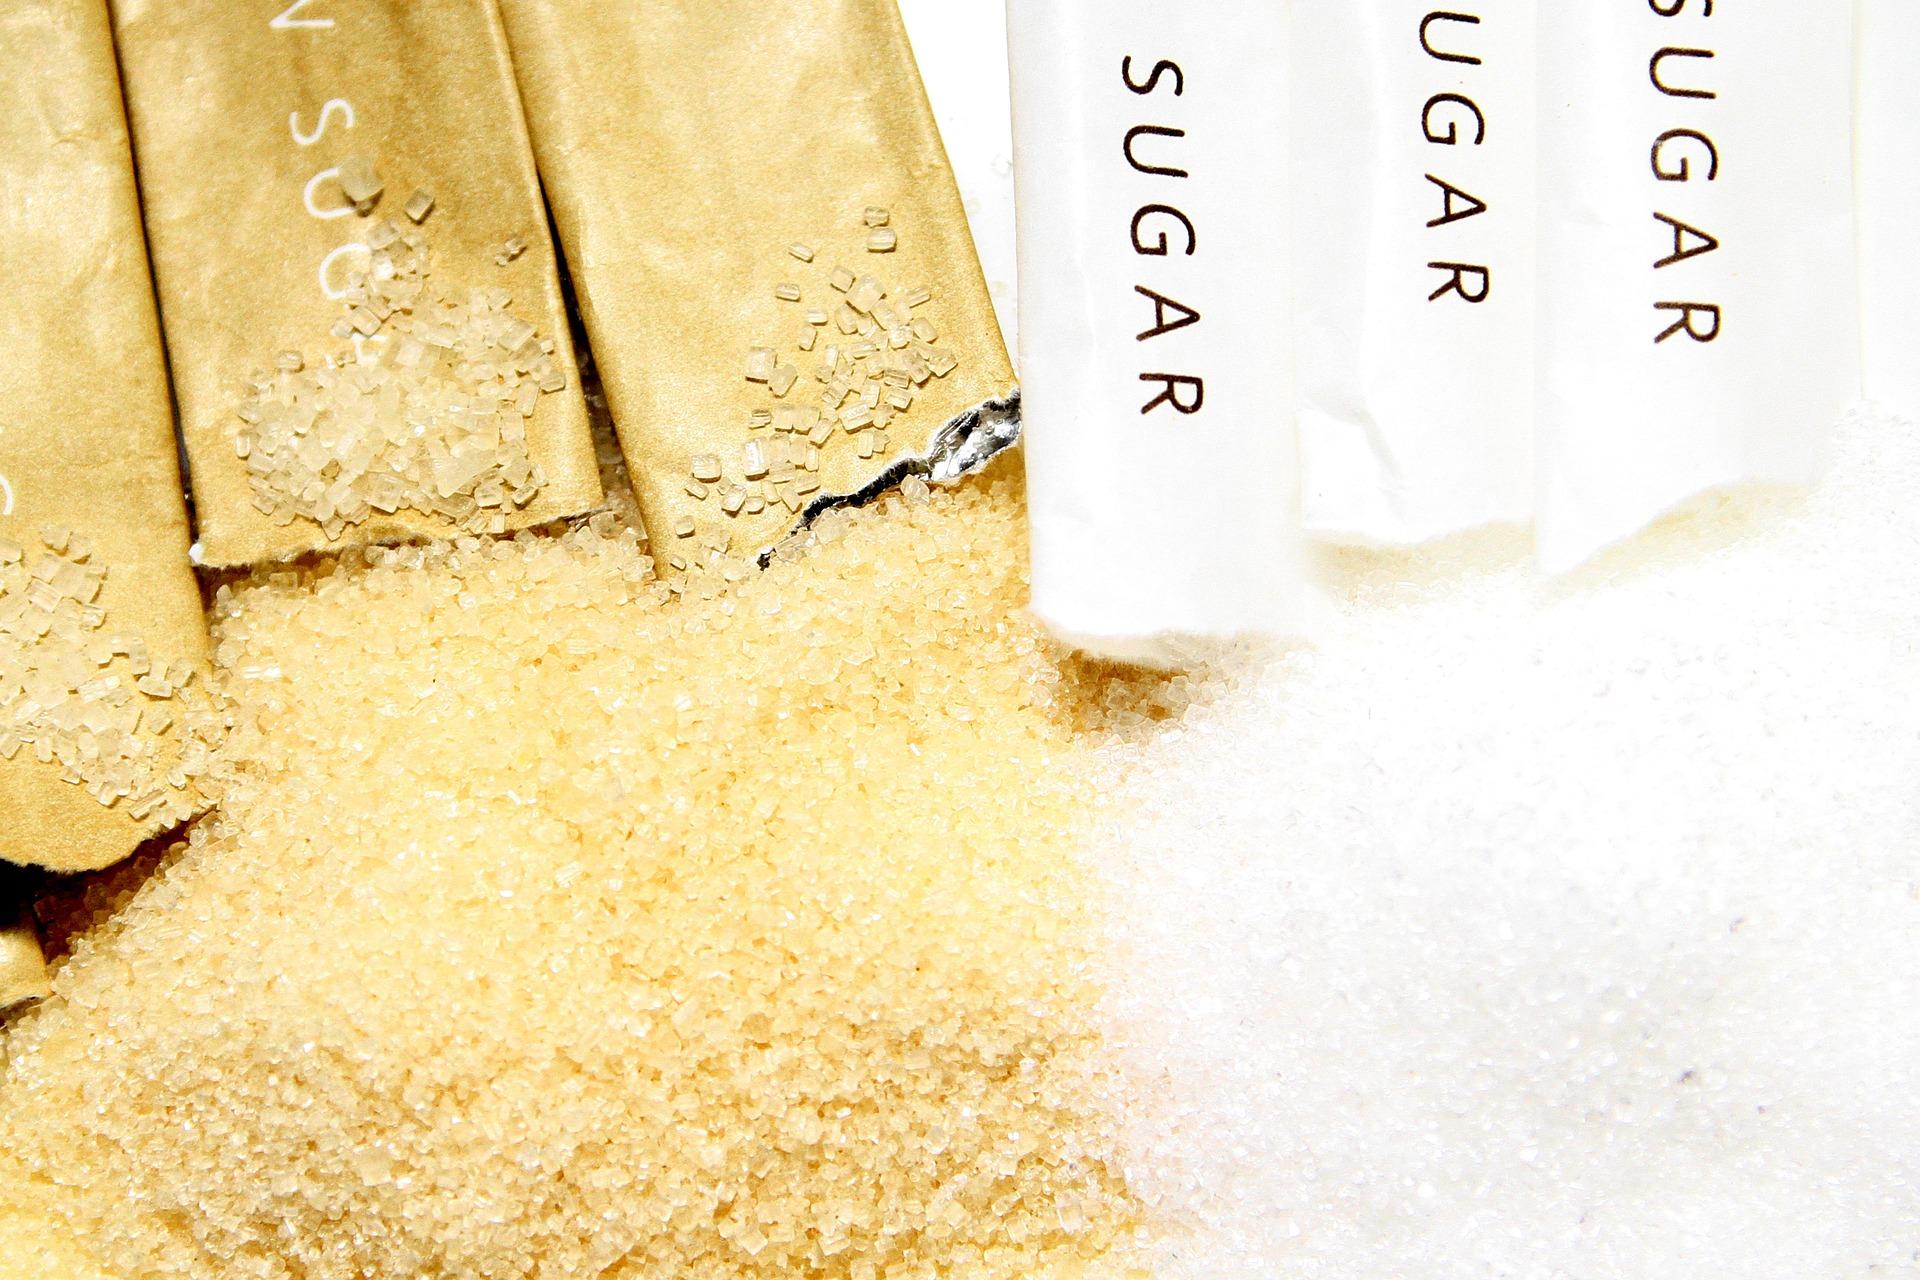 zuccheri naturali e artificiali e proteine dolci